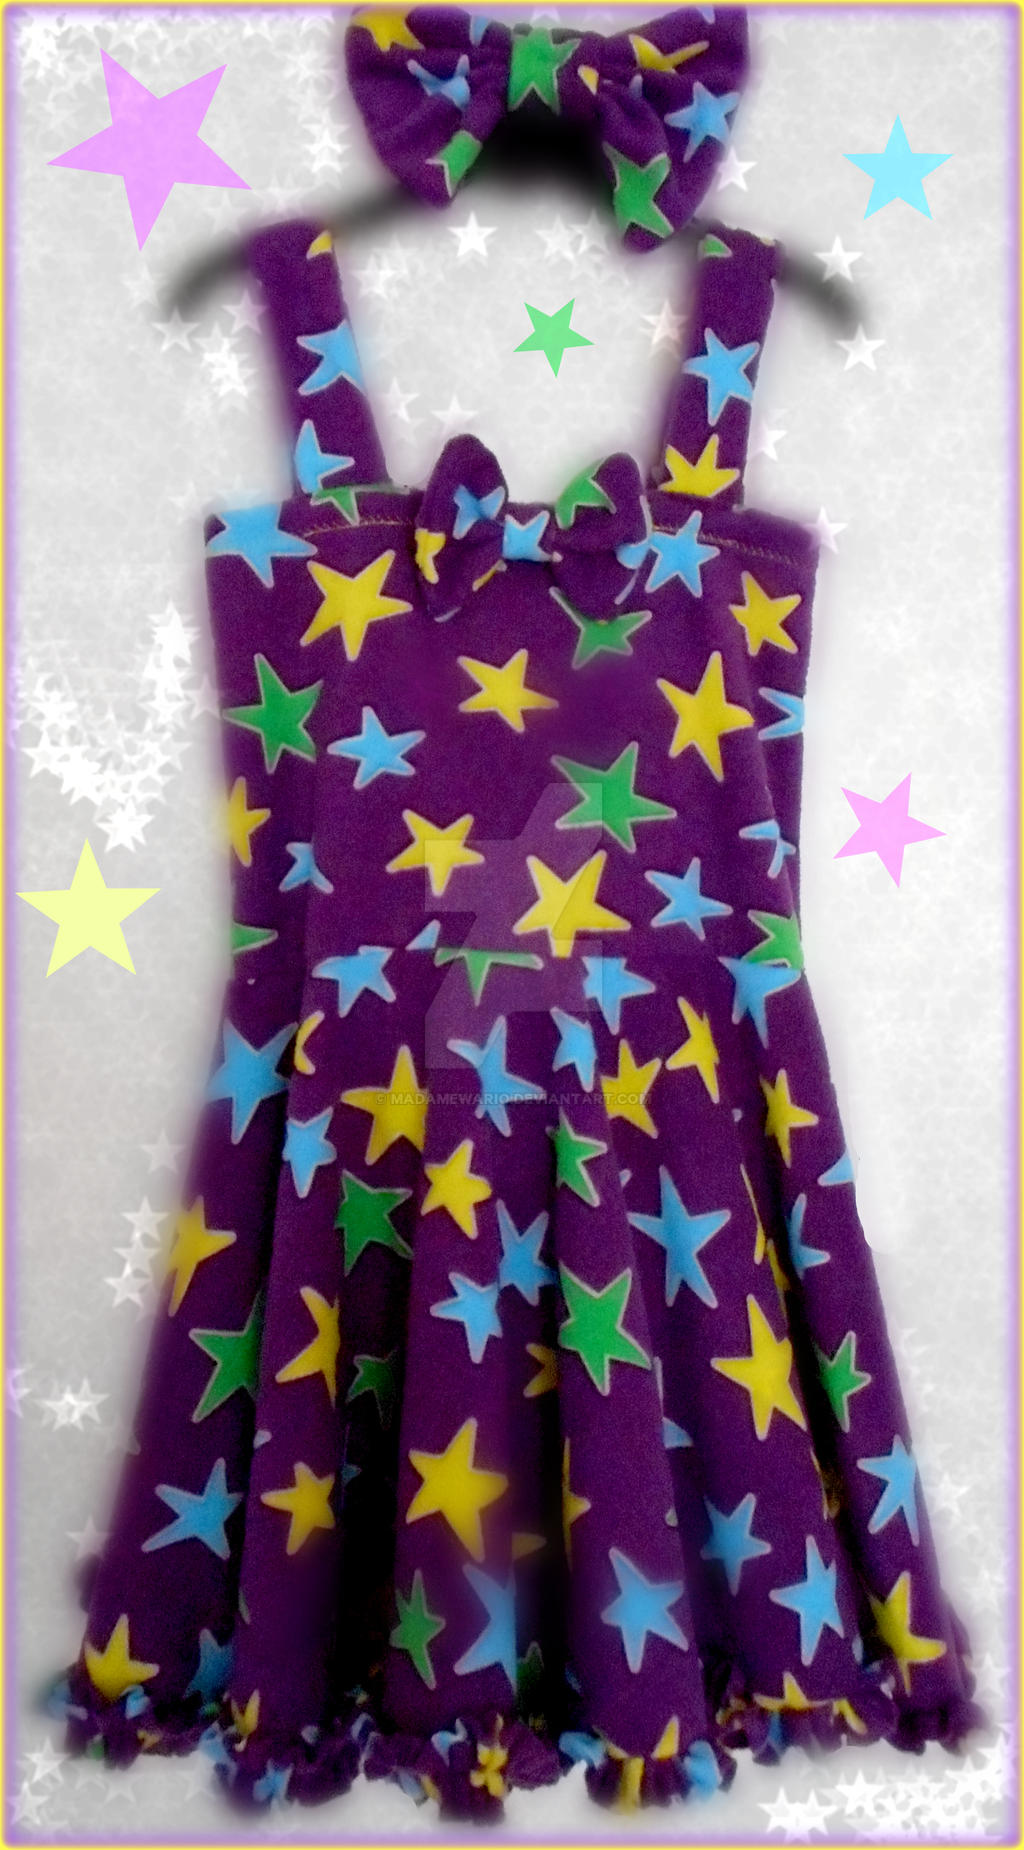 (Wario Party) Glow-in-the-Dark Star Dress by MadameWario